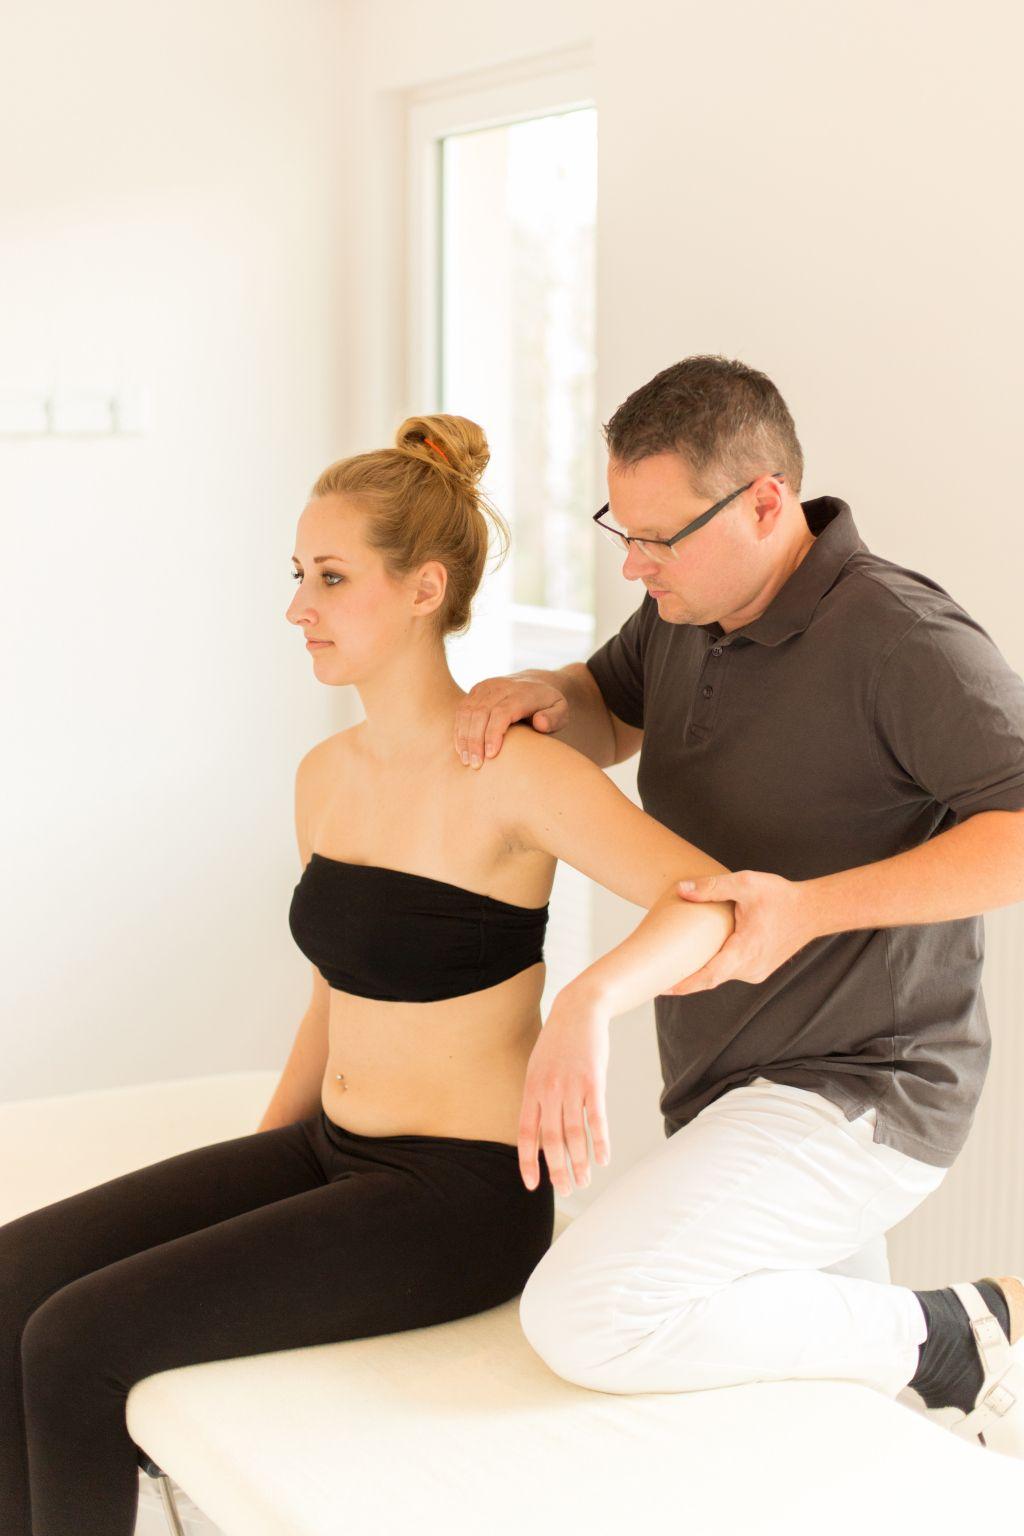 Das Foto zeigt Faszientherapeut Patrick Nehmzow bei der Körperbehandlung als Teil der Faszientherapie zur Schmerzbehandlung